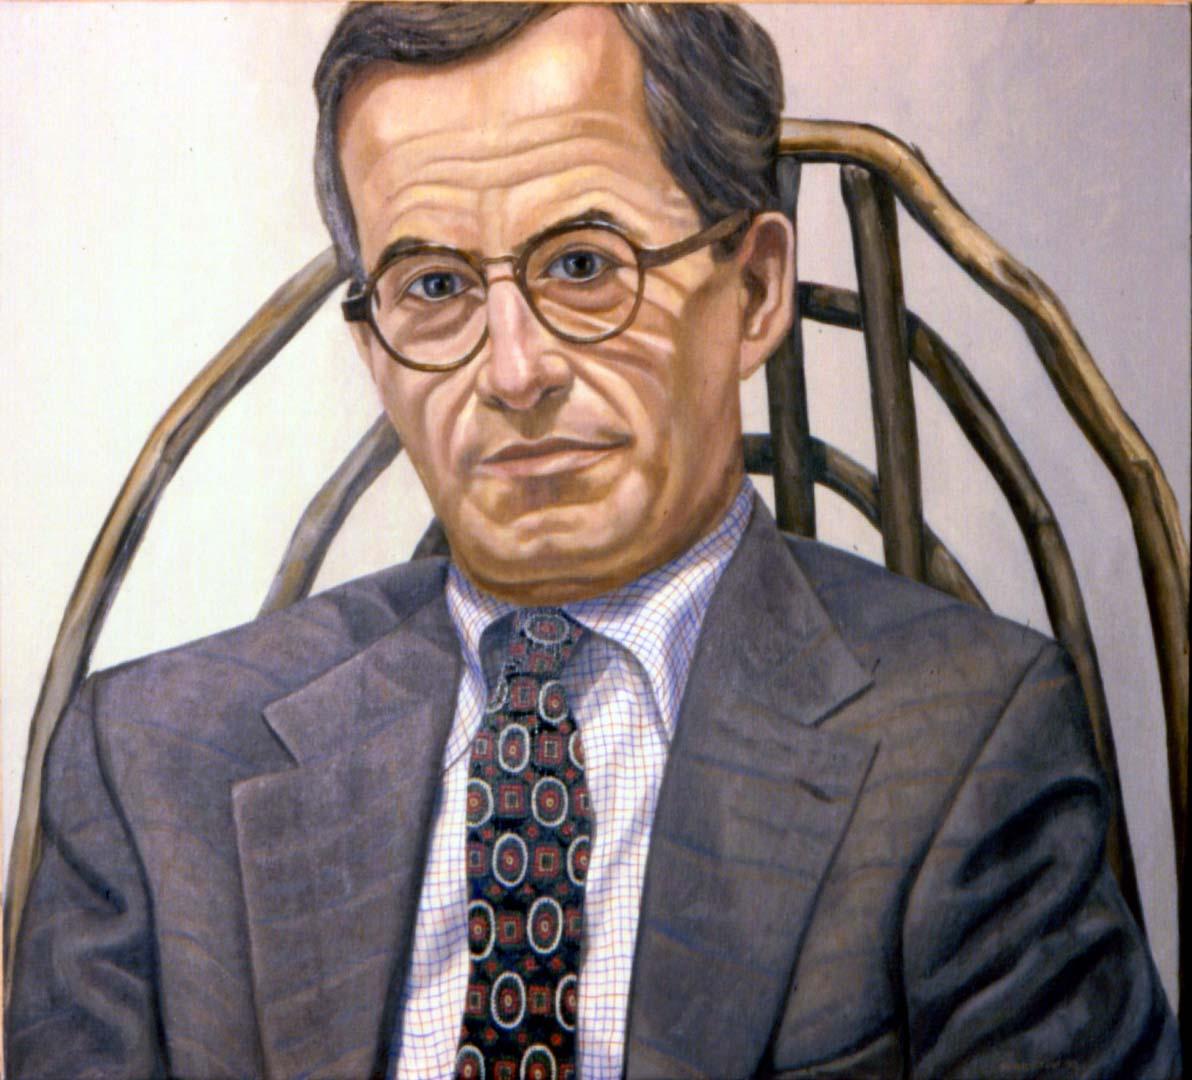 1994 Portrait of Stewart Feld Oil on canvas Dimensions Unknown